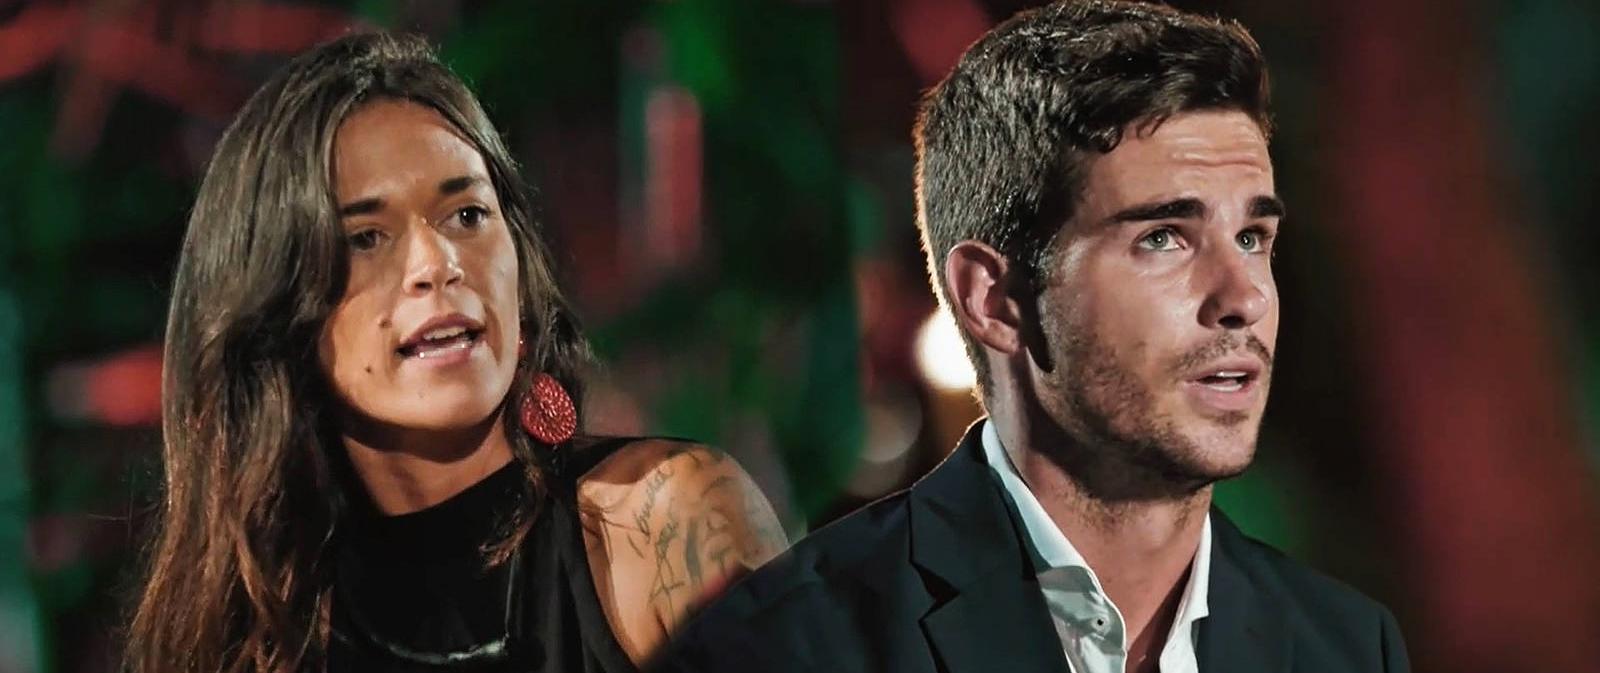 Alex i Fiama trenquen a 'La isla de las tentaciones' - Telecinco